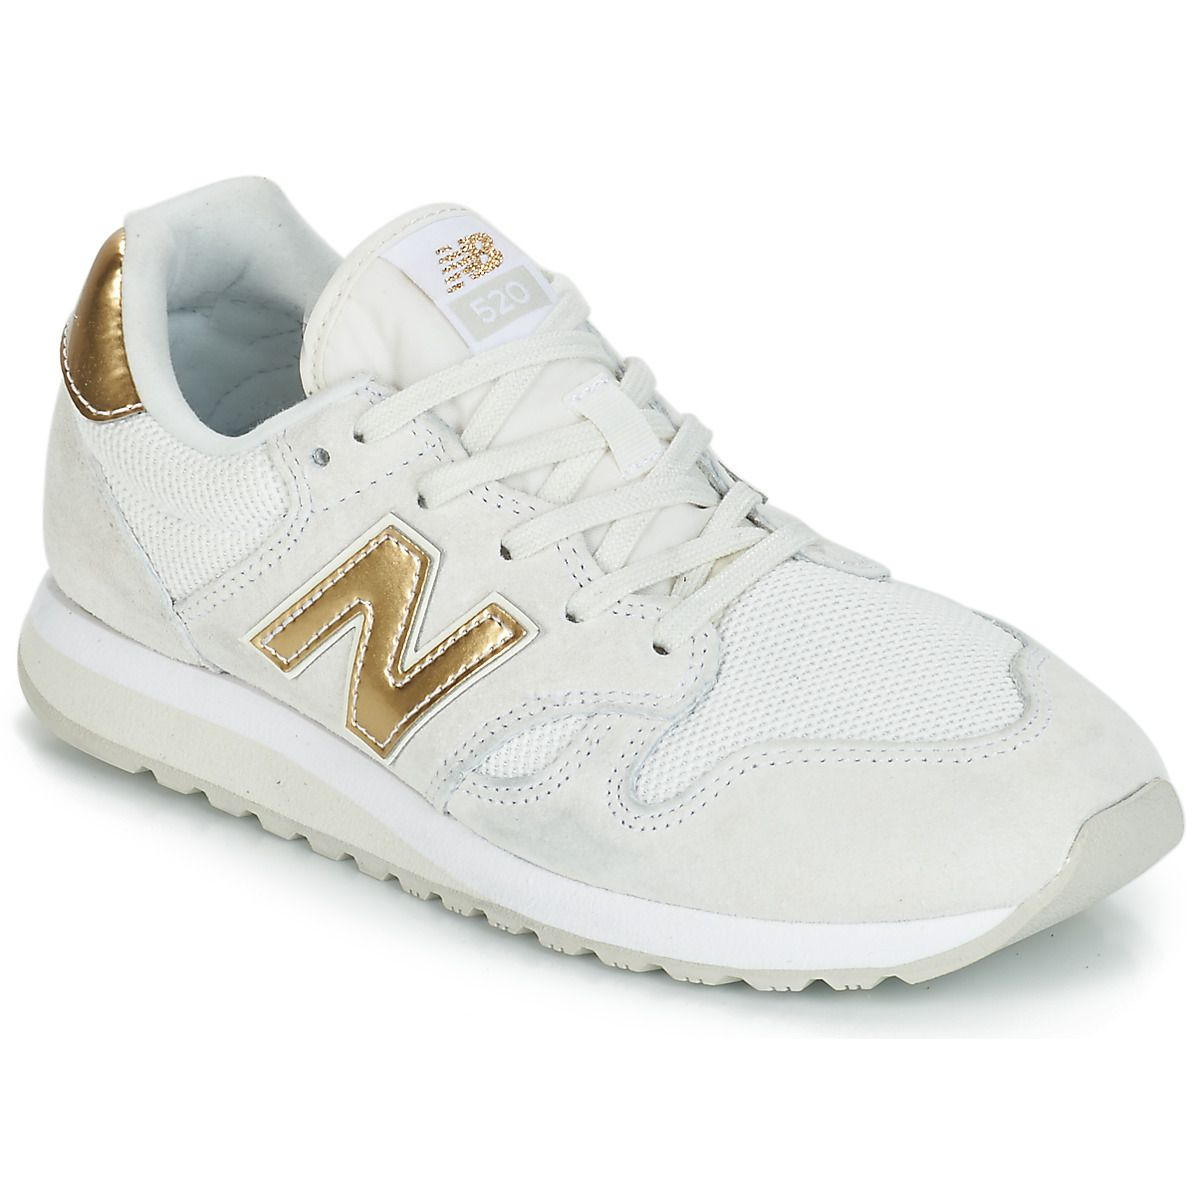 scarpe donna new balance con tacco